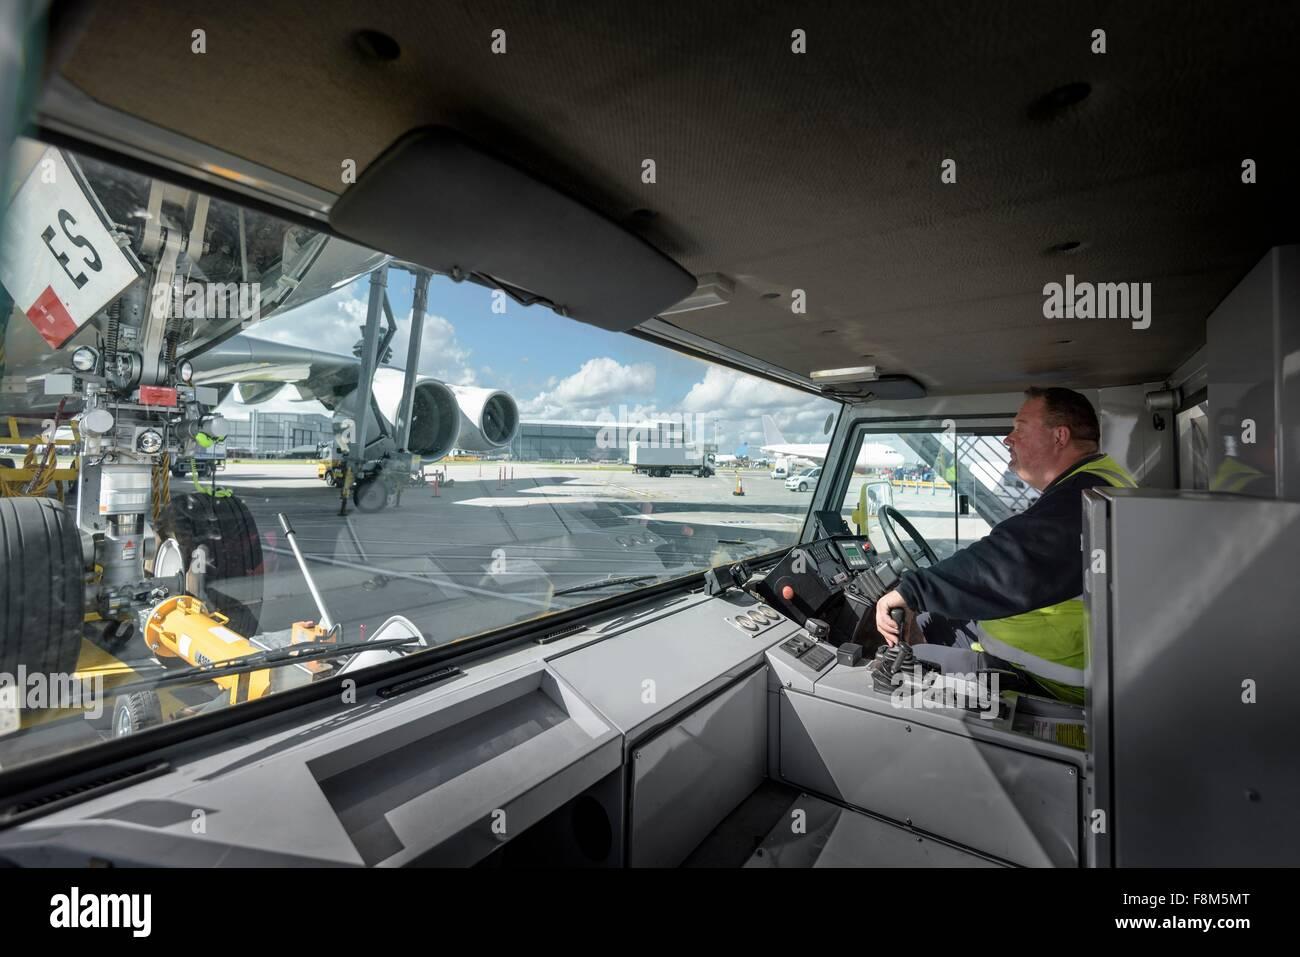 Controlador de remolcador remolcar aviones A380 Imagen De Stock